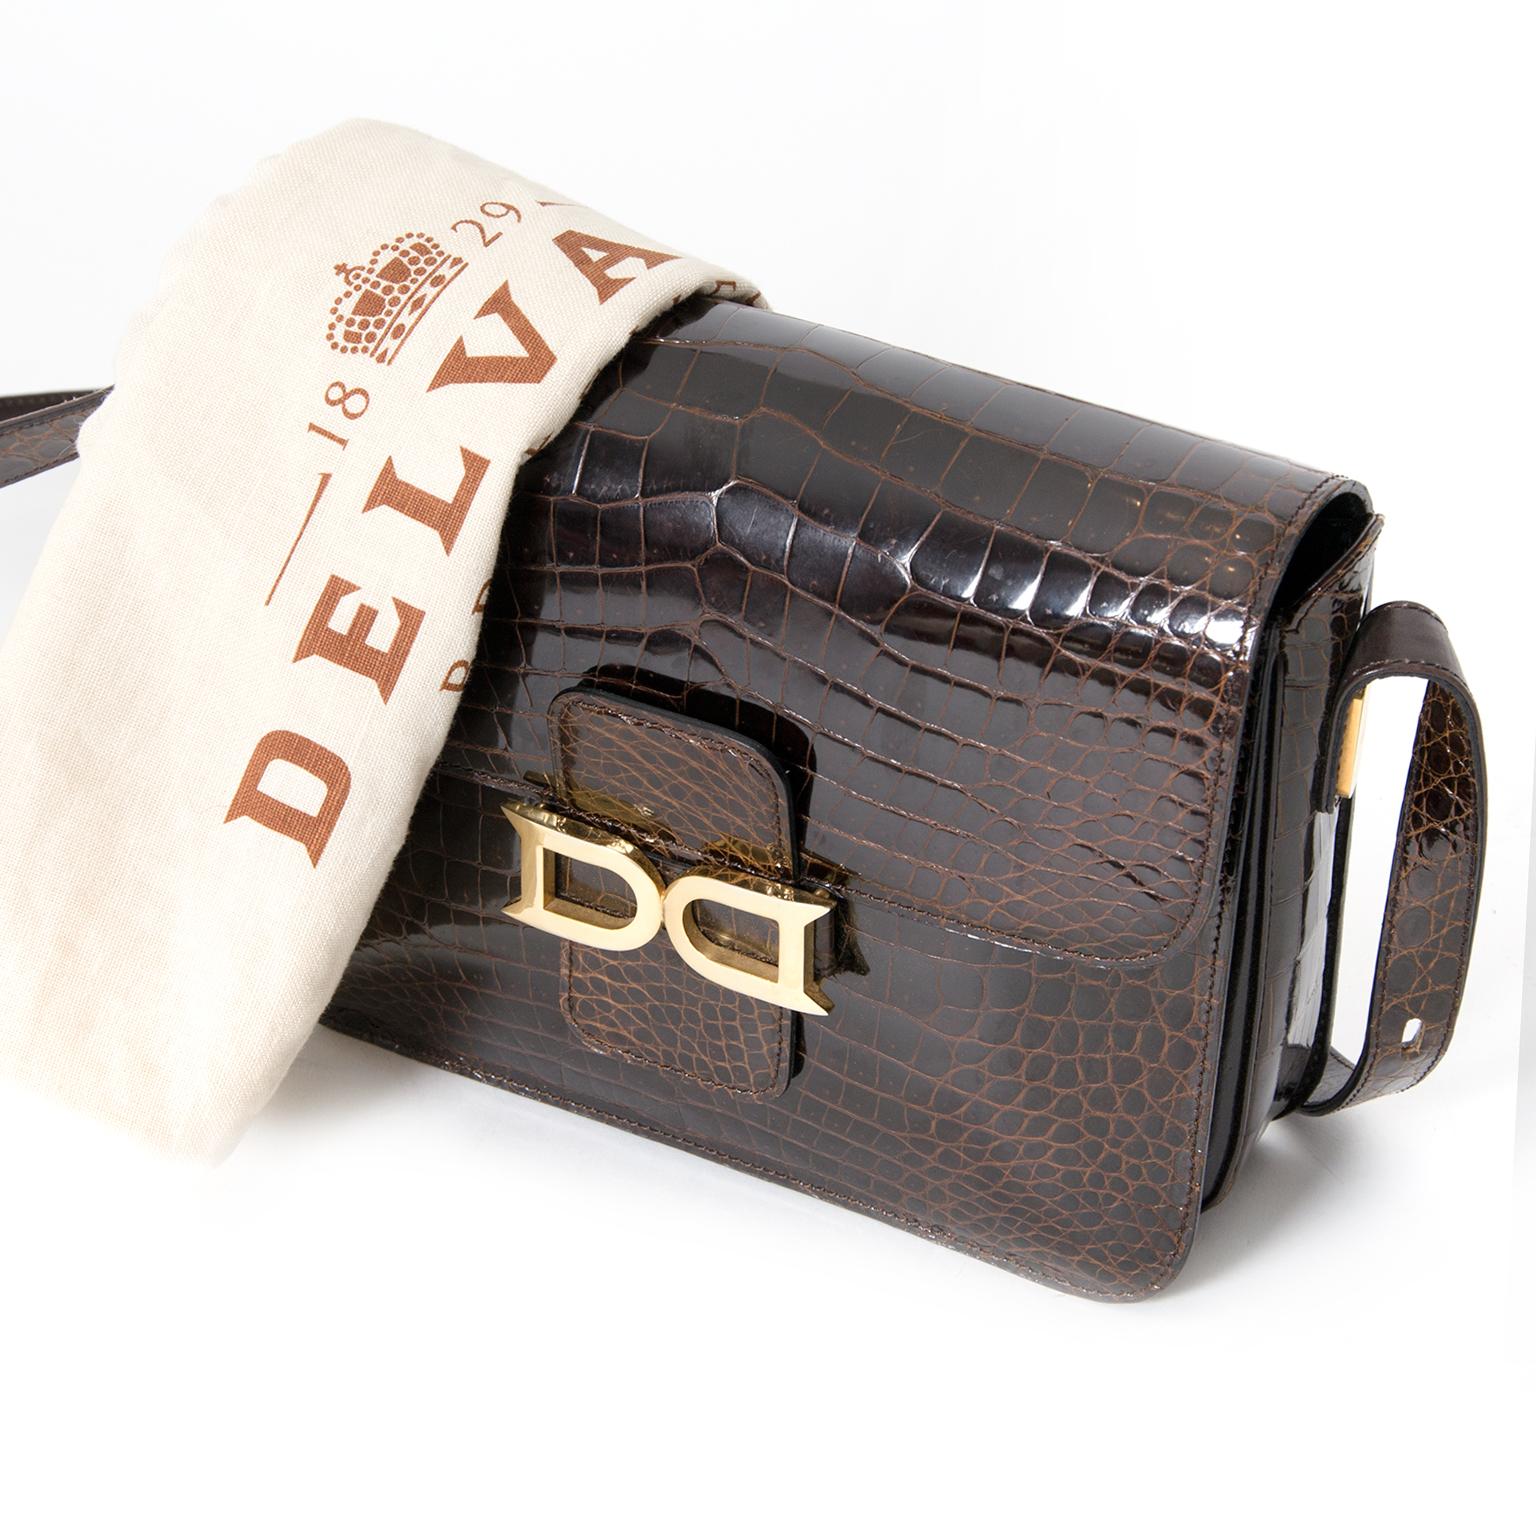 d04e5e219dc9f ... Delvaux Dark Brown Crocodile Bourgogne Shoulder Bag like new 100%  authentic designer Delvaux